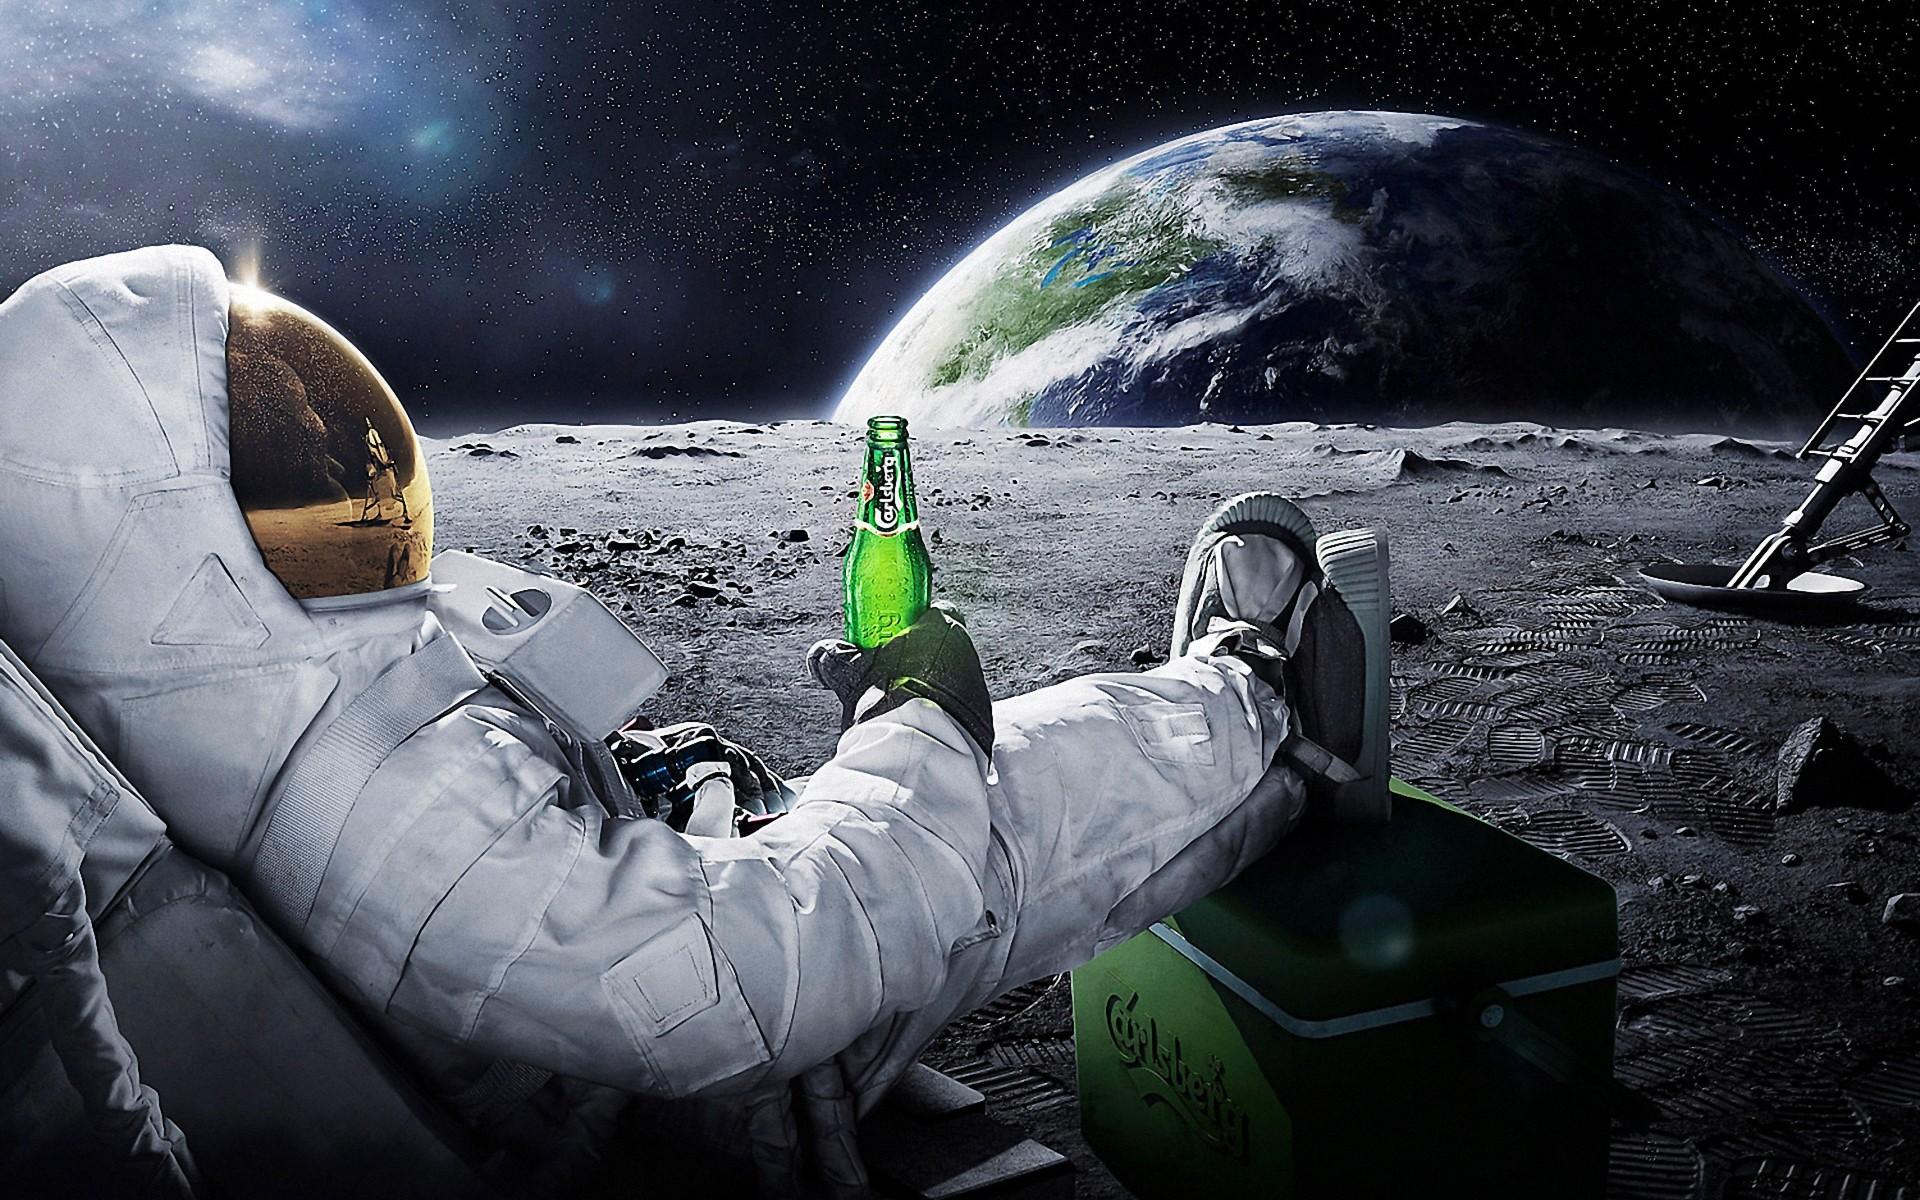 космос трава космонавт space grass astronaut  № 3317087 бесплатно